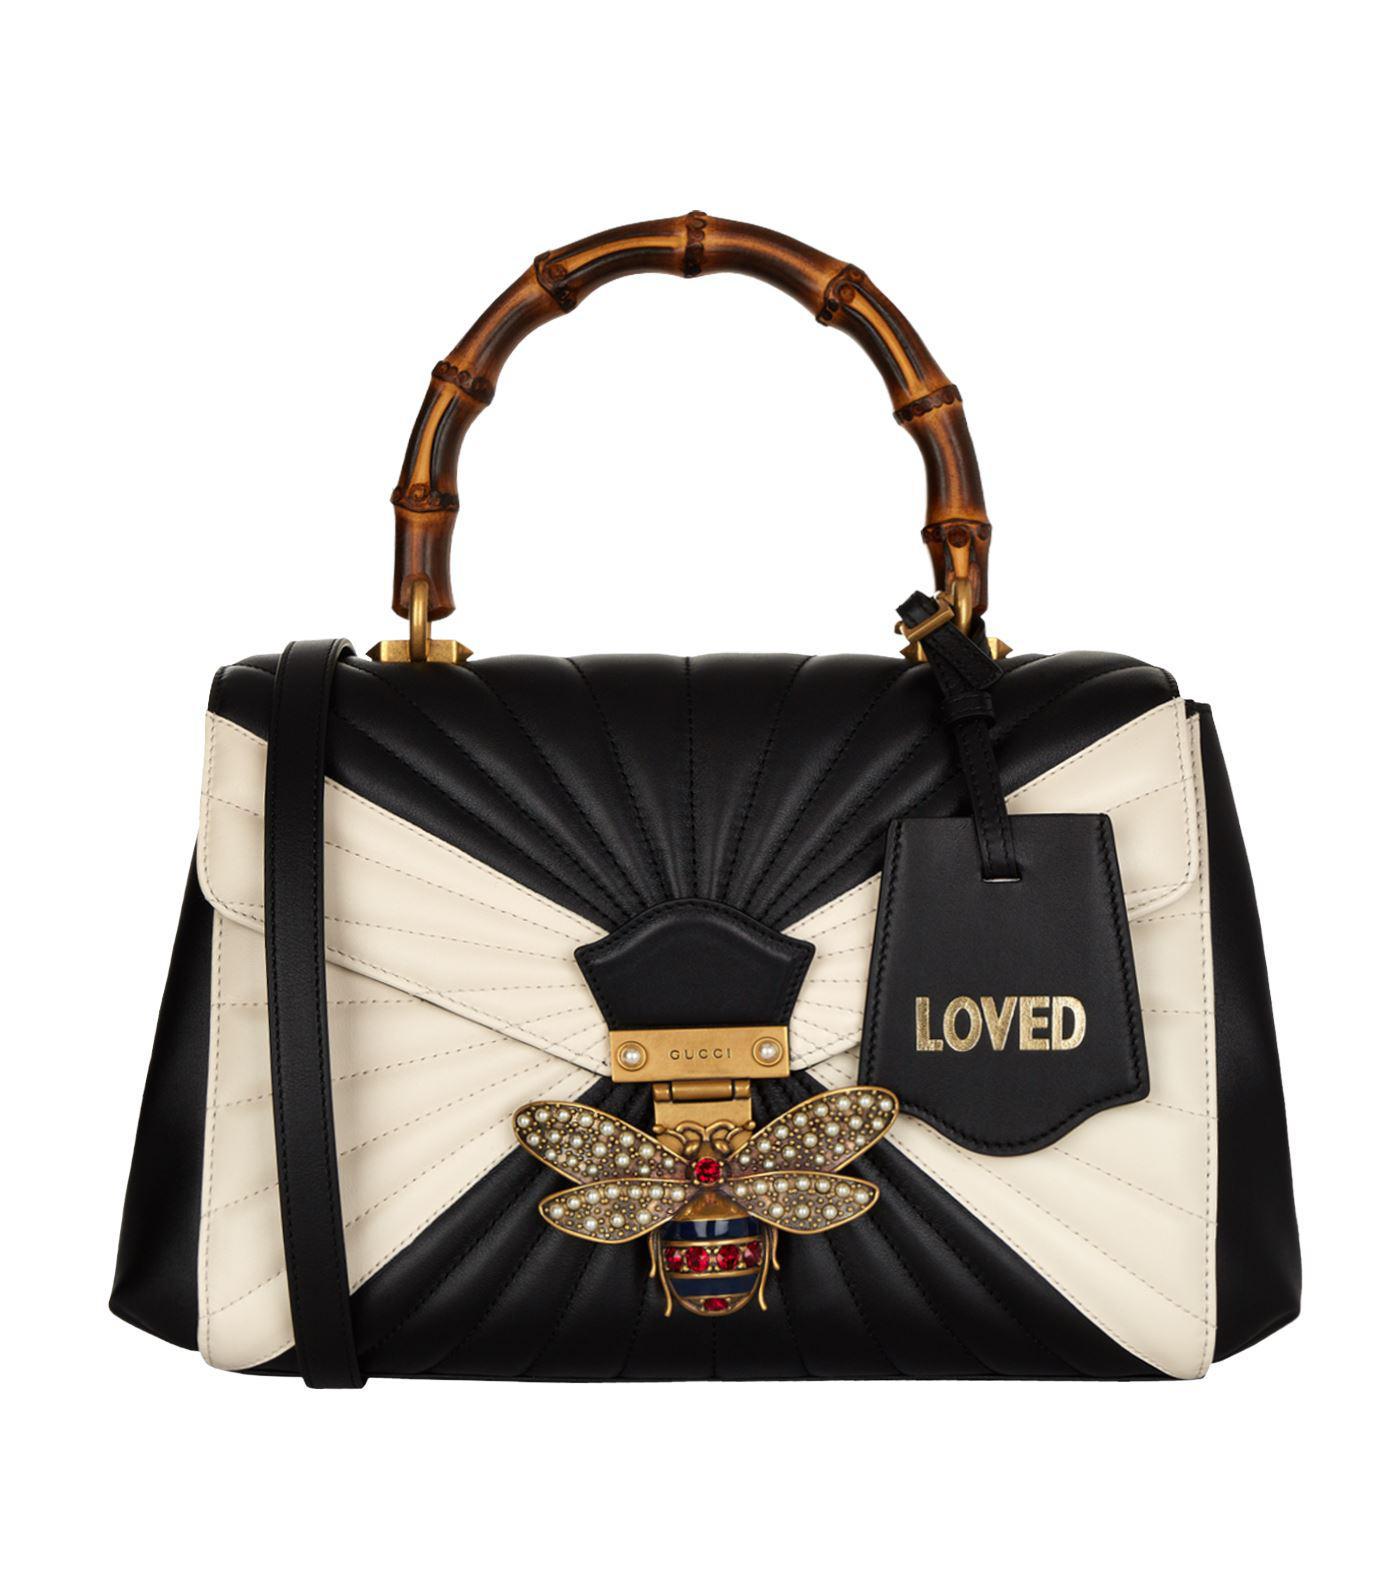 d9bdefba7719 Gucci Queen Margaret Bamboo Top Handle Bag in Black - Lyst